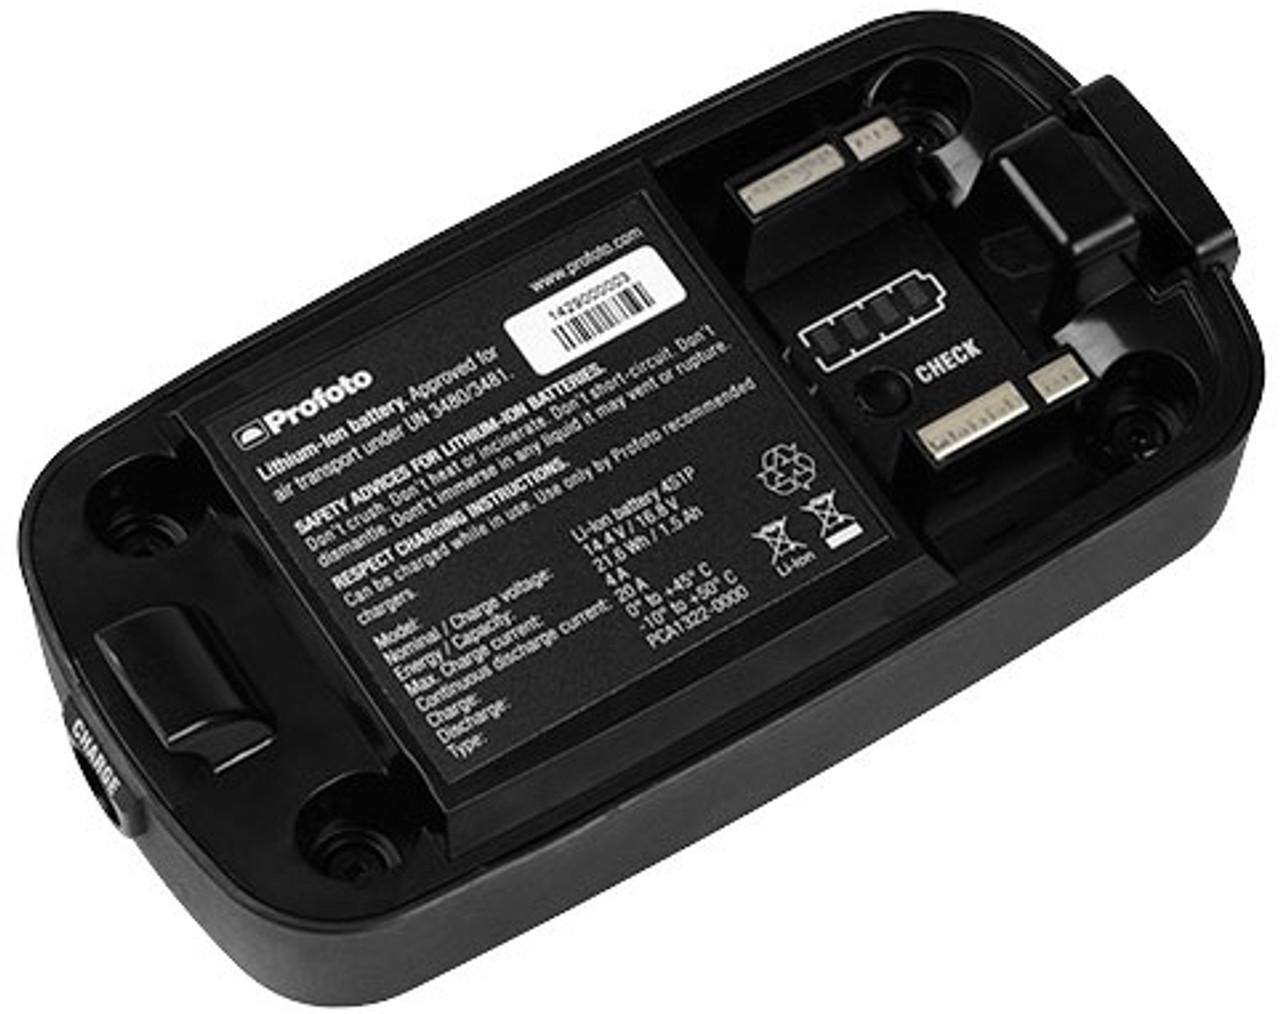 Profoto Li-ion Battery for B2